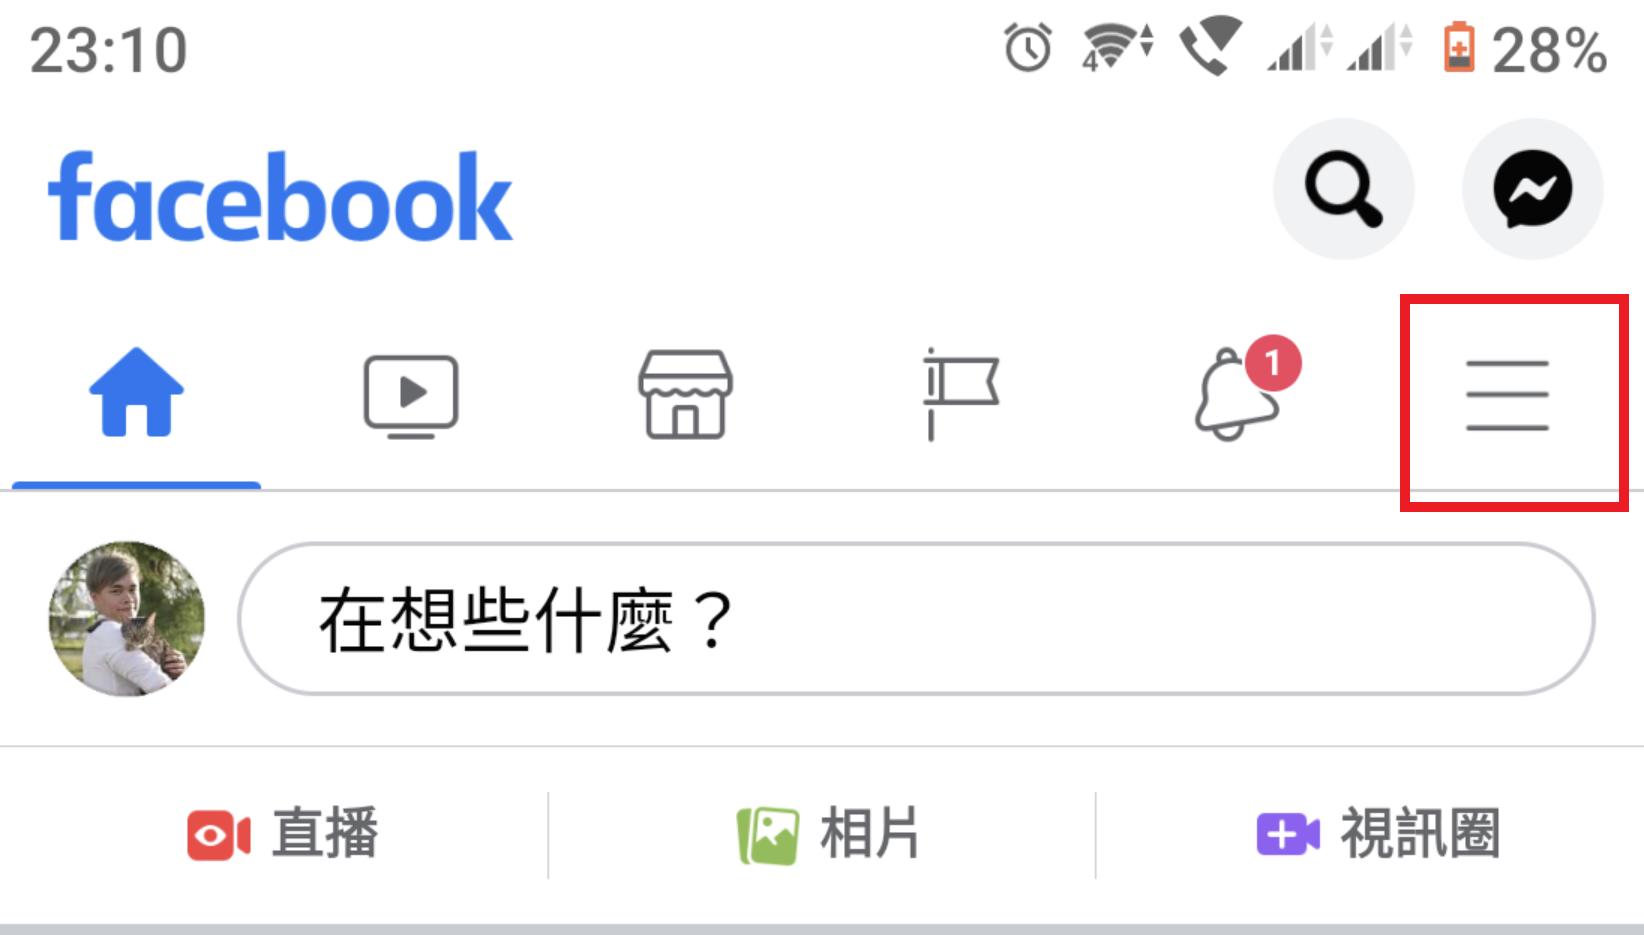 Facebook 新功能,帶你製作屬於自己的虛擬替身 - 2